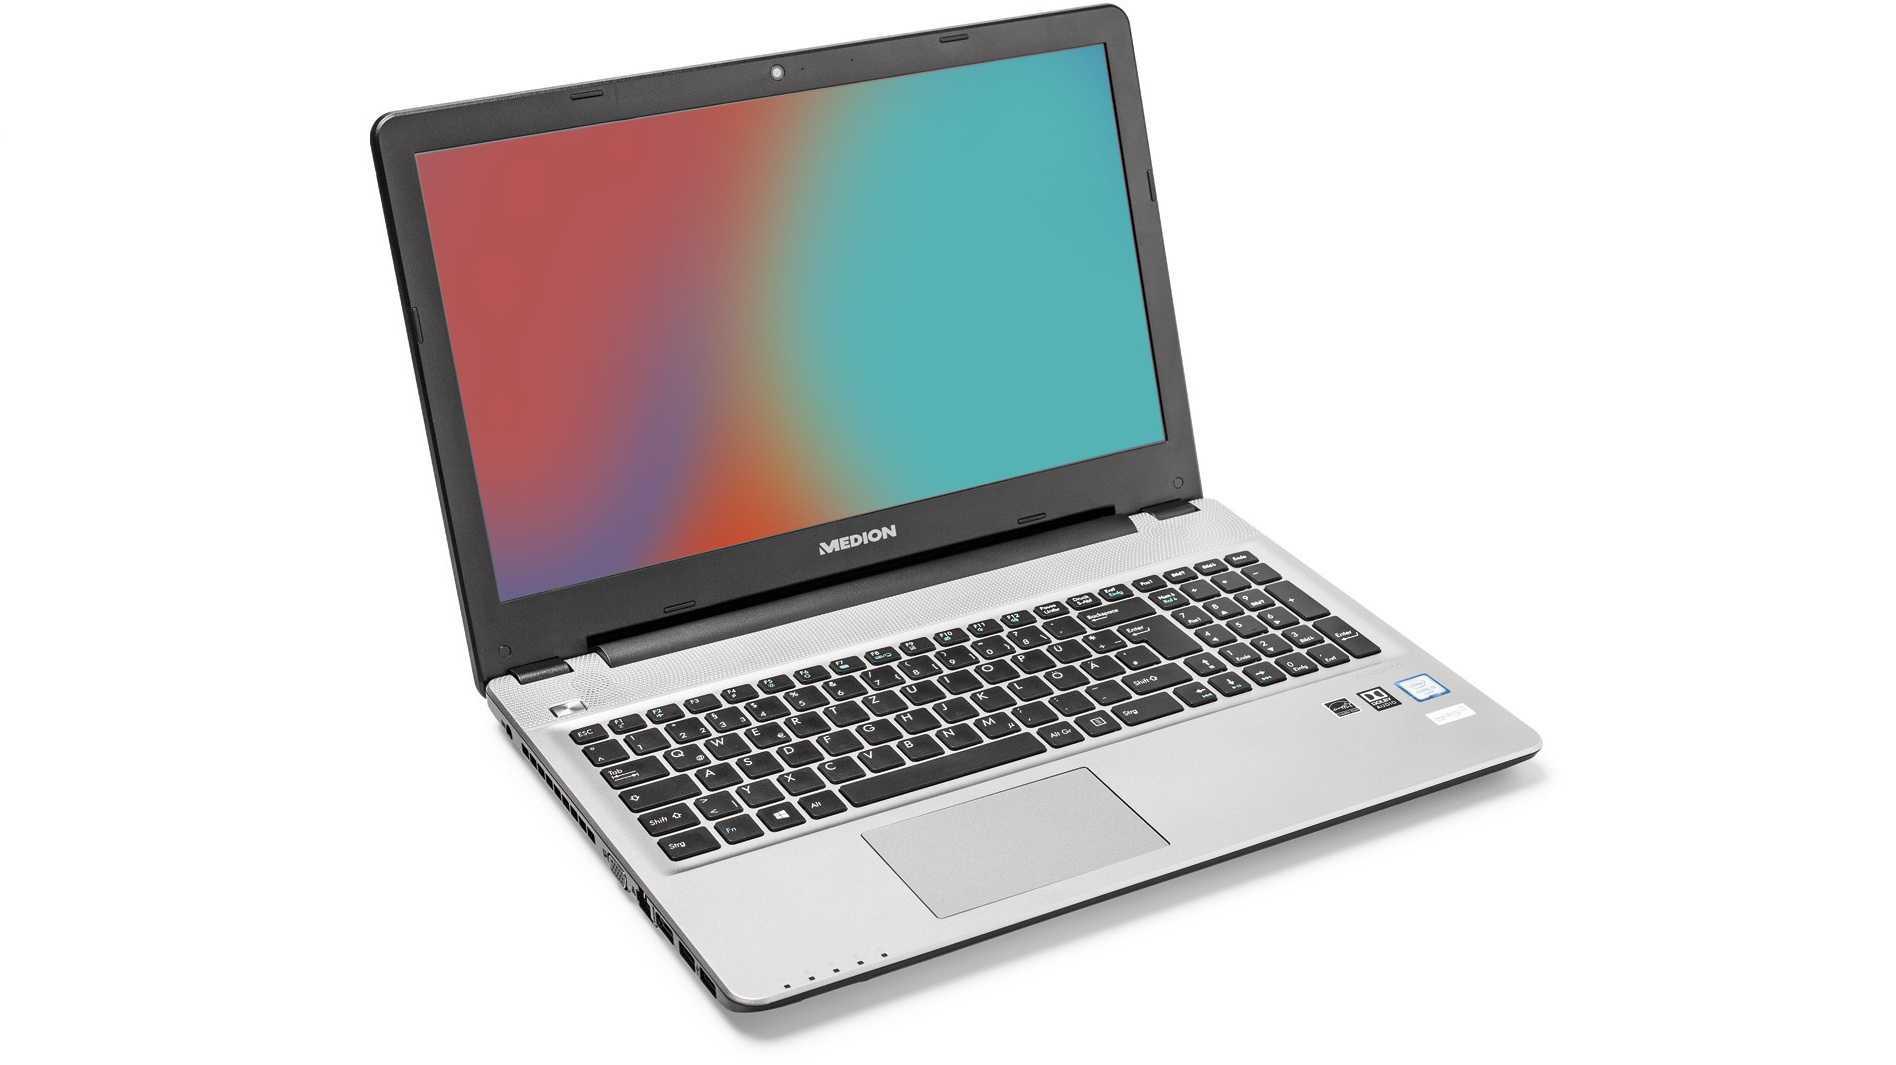 Medion-Notebook Akoya E6424 kommt auch zu Aldi Süd